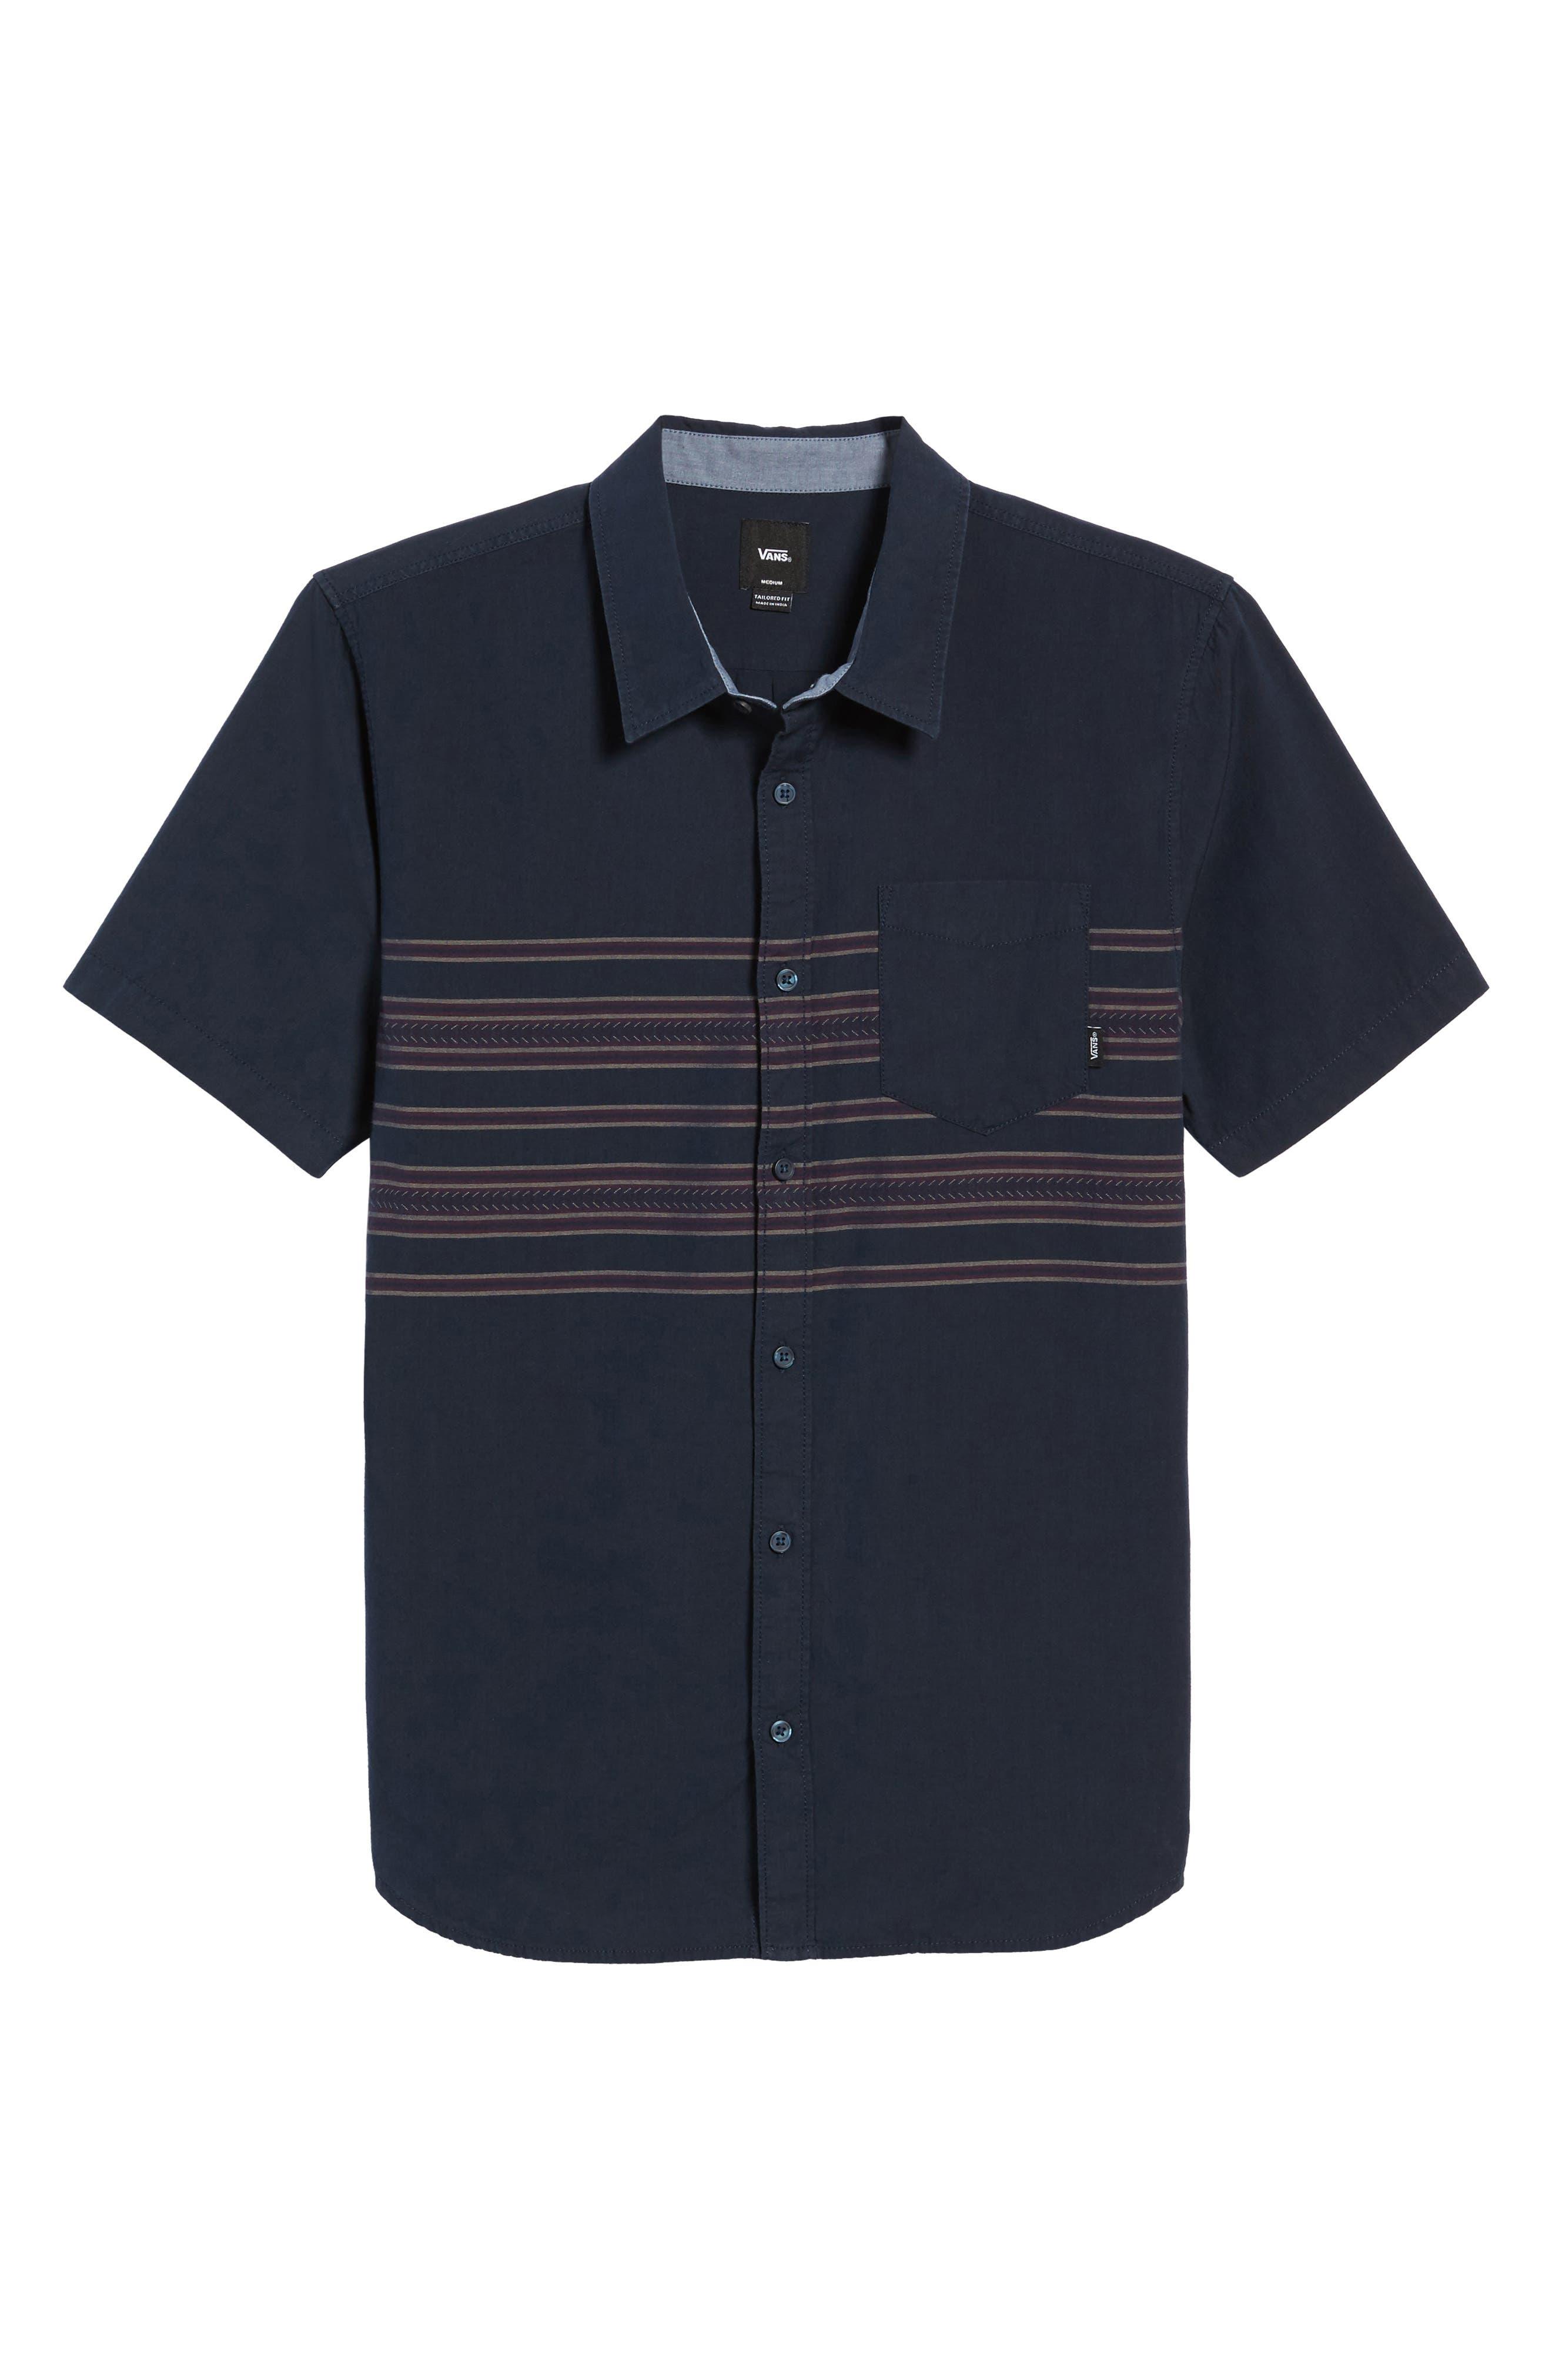 Alternate Image 6  - Vans Benmore Striped Woven Shirt